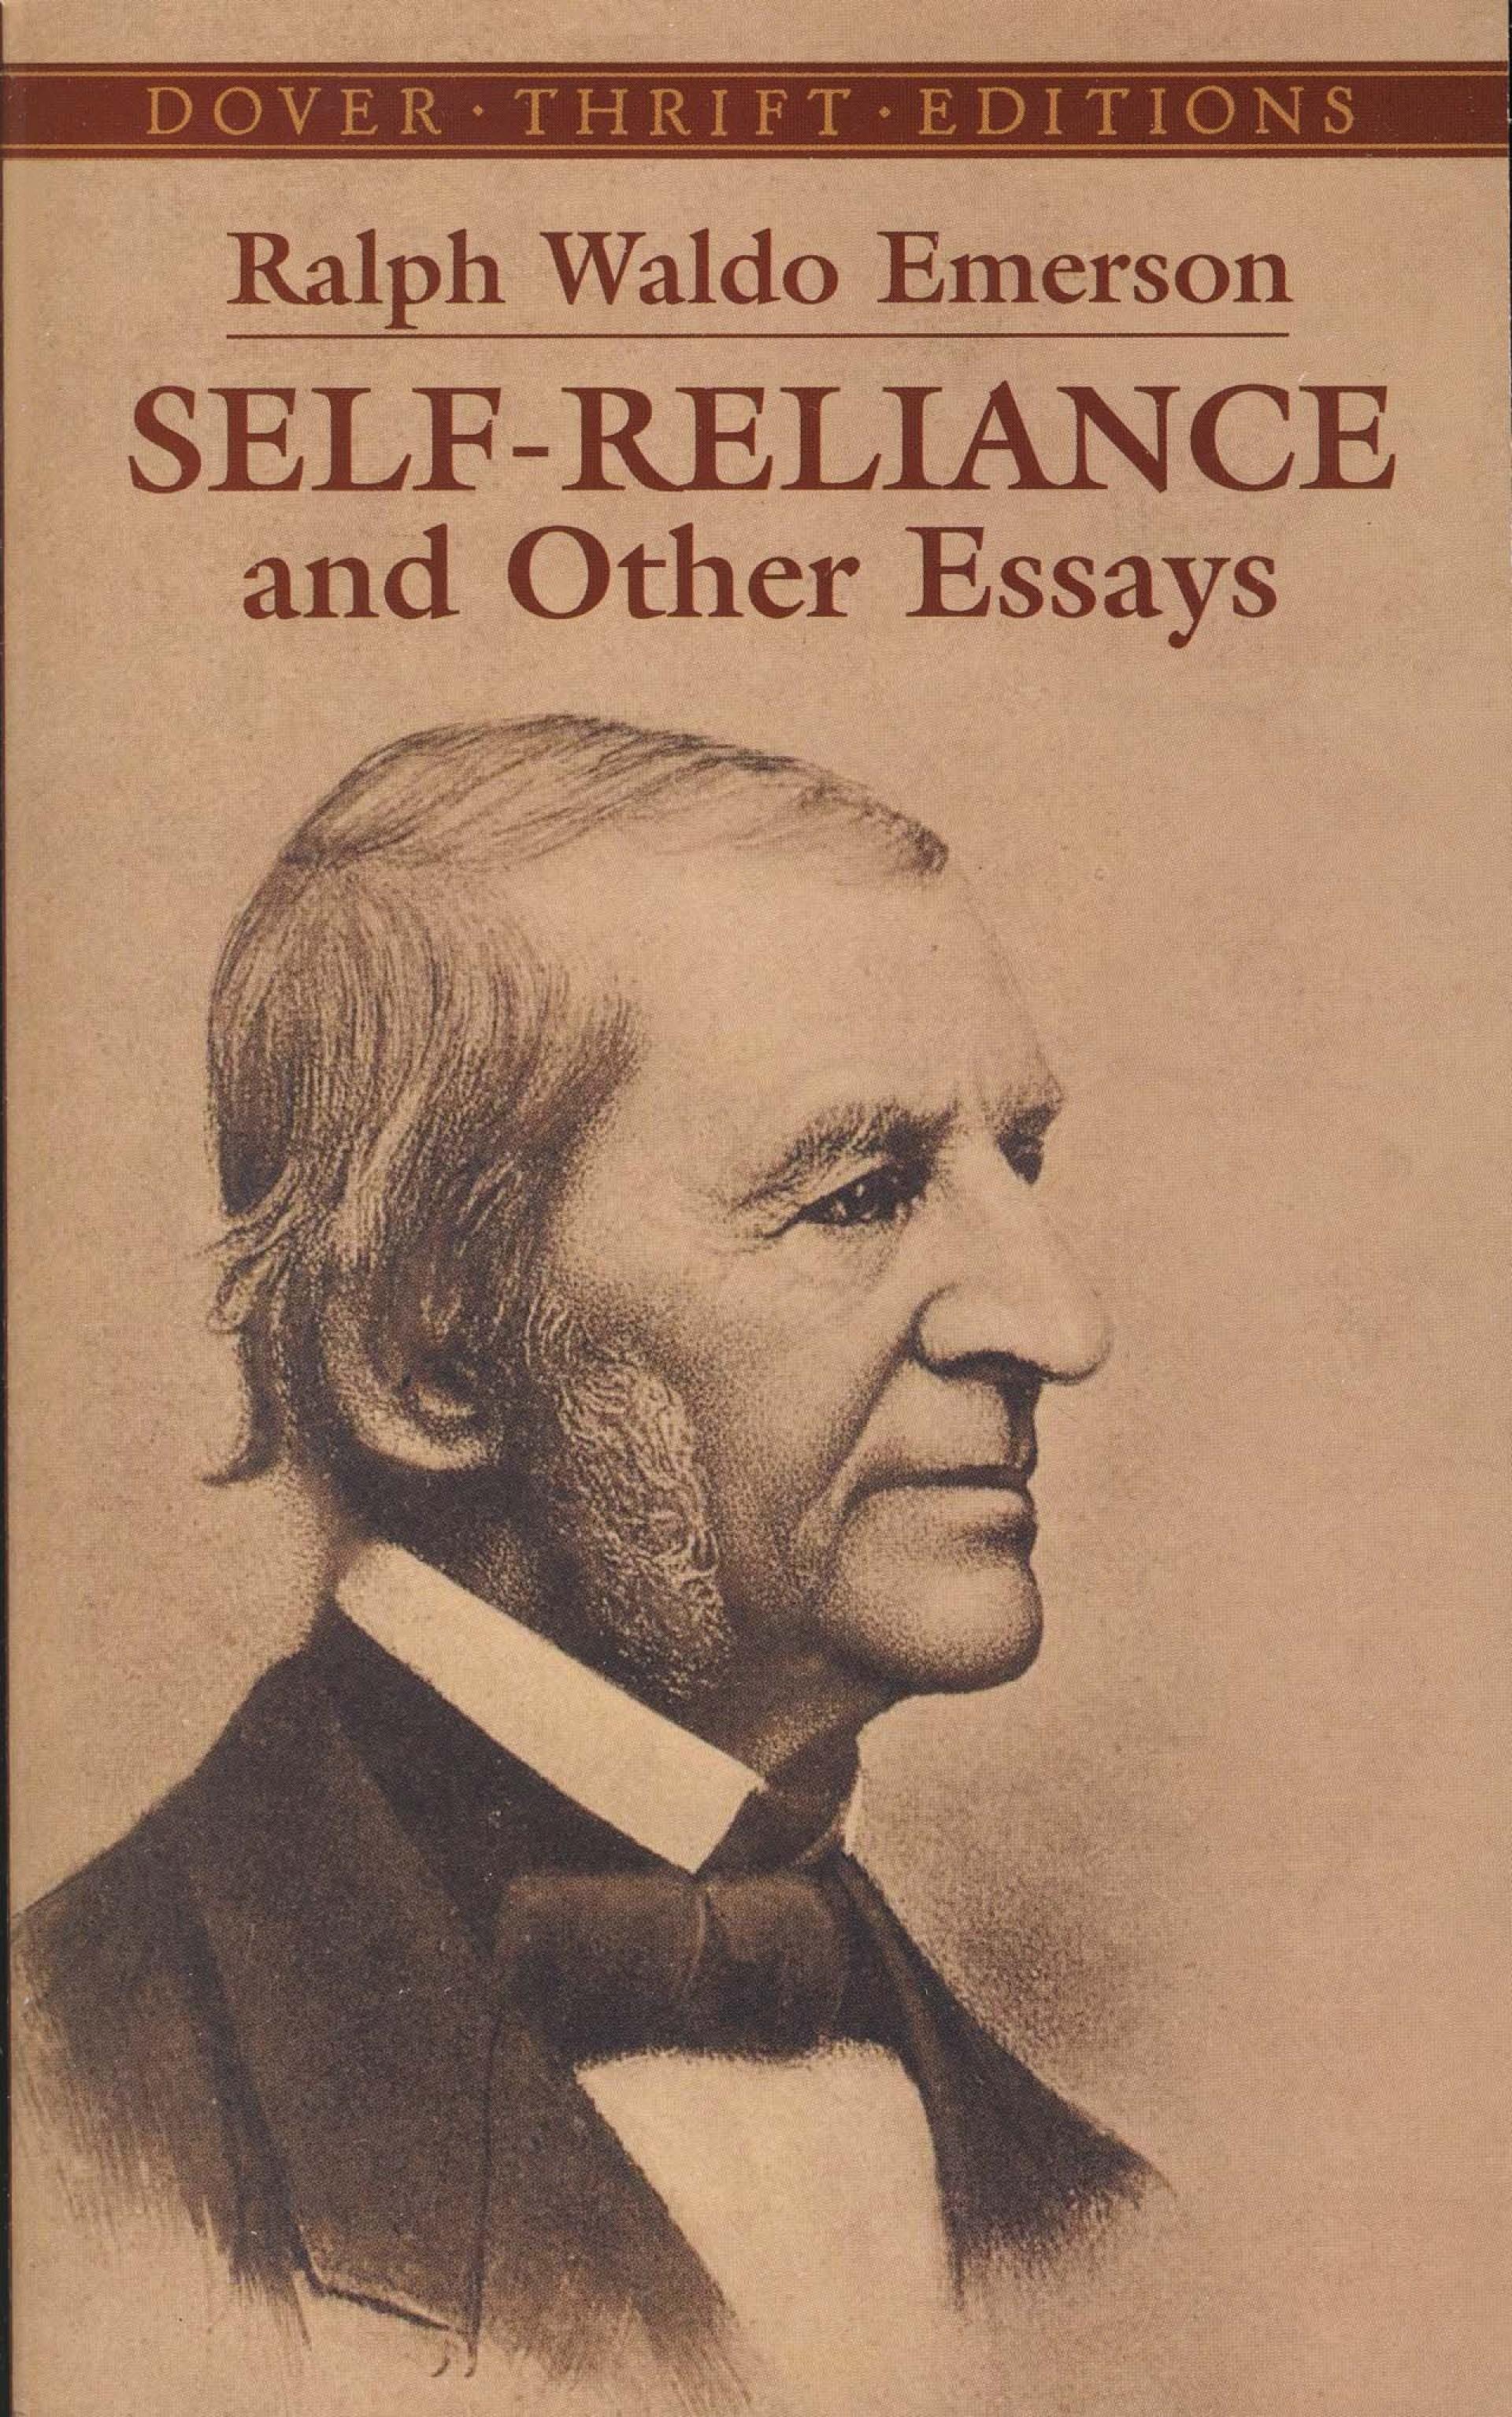 001 Essay Example 91btiwopxal Self Reliance And Other Formidable Essays Ralph Waldo Emerson Pdf Ekşi 1920